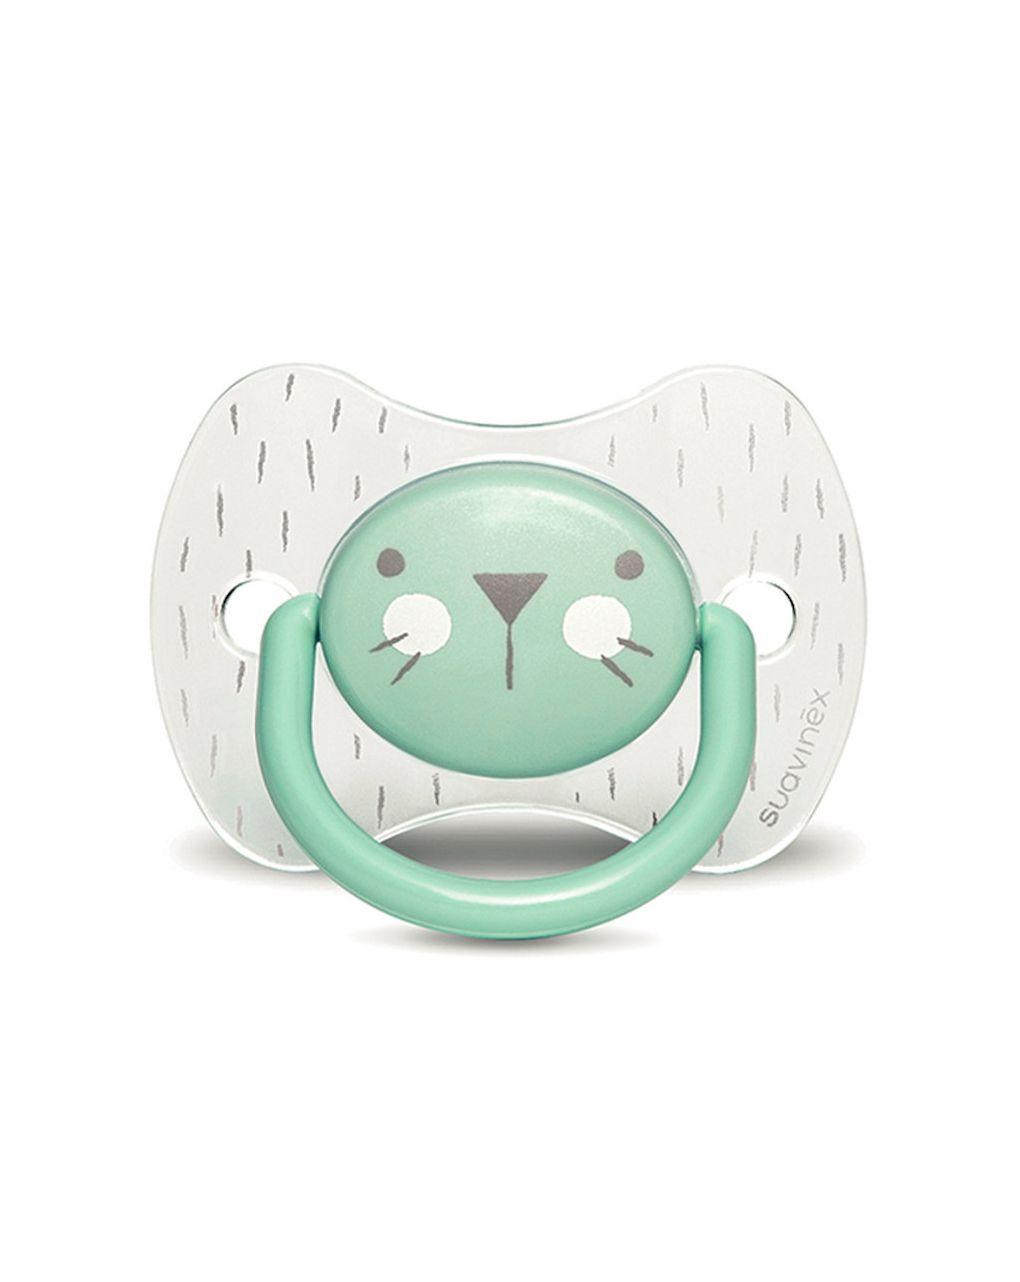 Hygge succh ana s 6-18 coniglio verde crystal - Suavinex